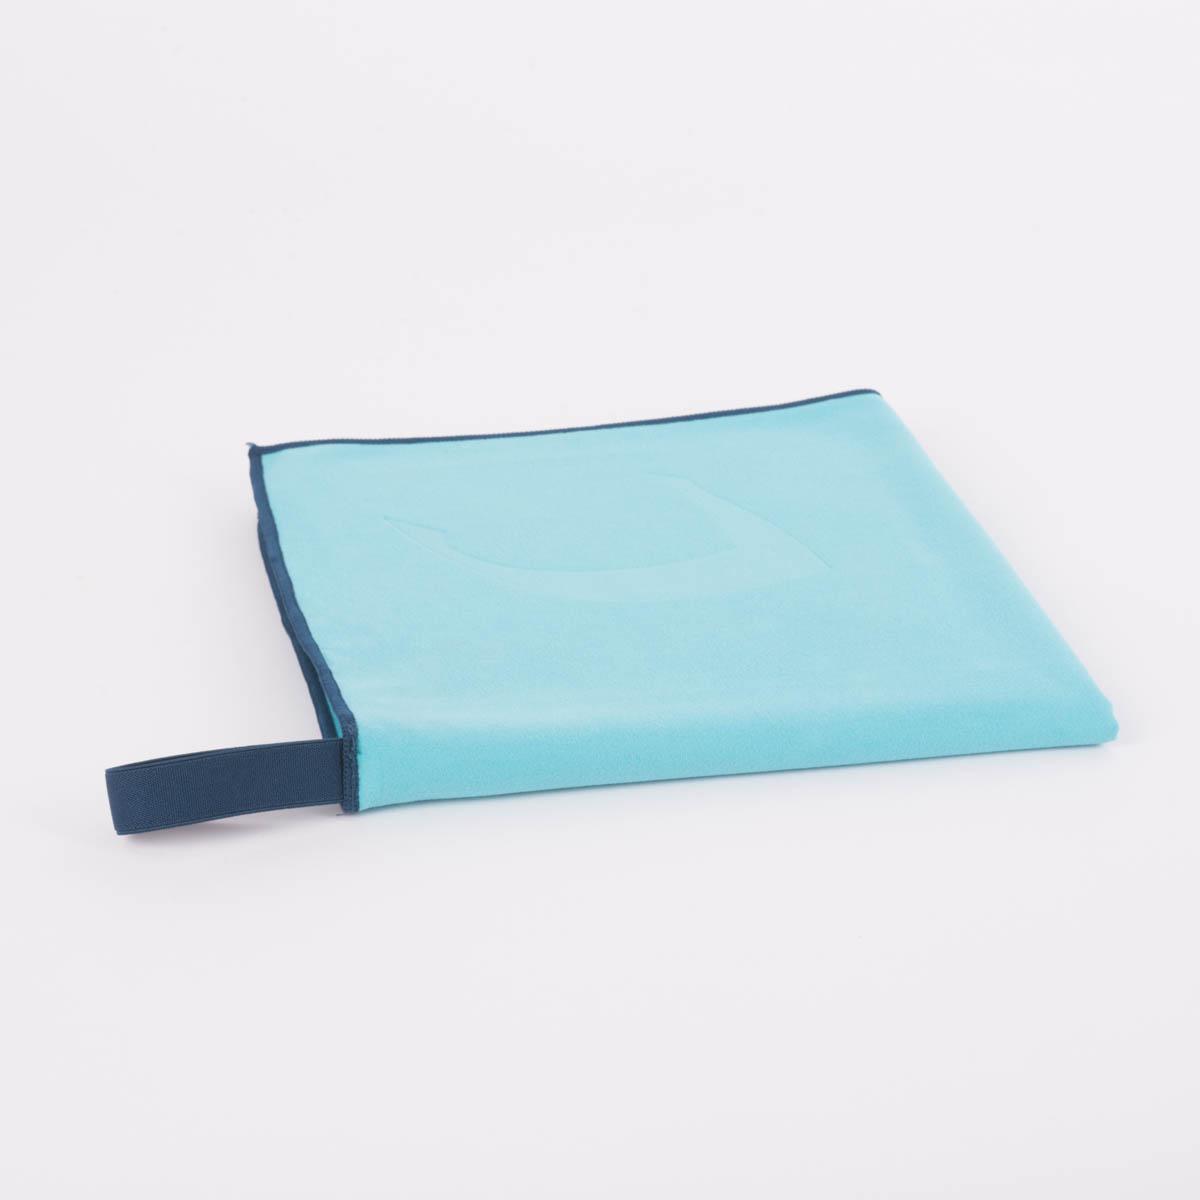 Clarysse Microvezel sneldrogende badlaken 80x150 Aqua